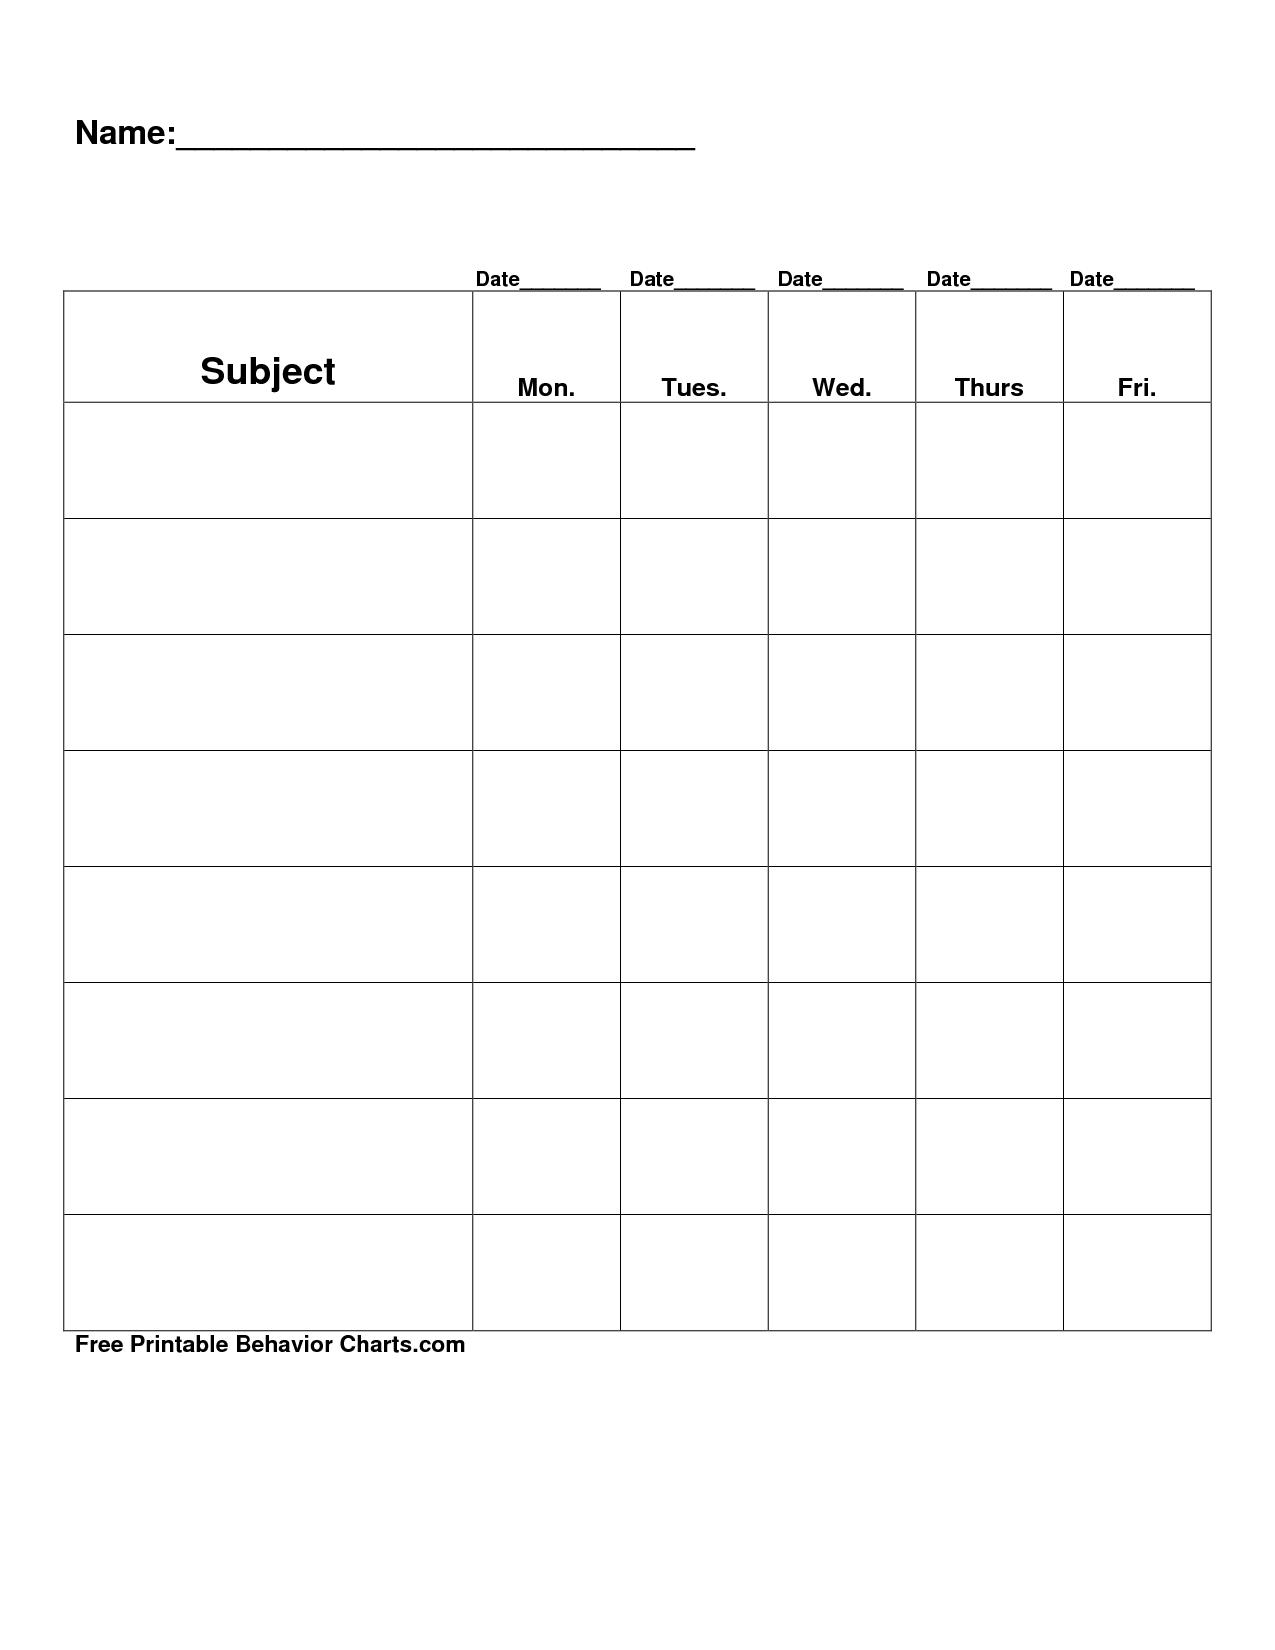 Free Printable Blank Charts | Free Printable Behavior Charts Pertaining To Blank Reward Chart Template